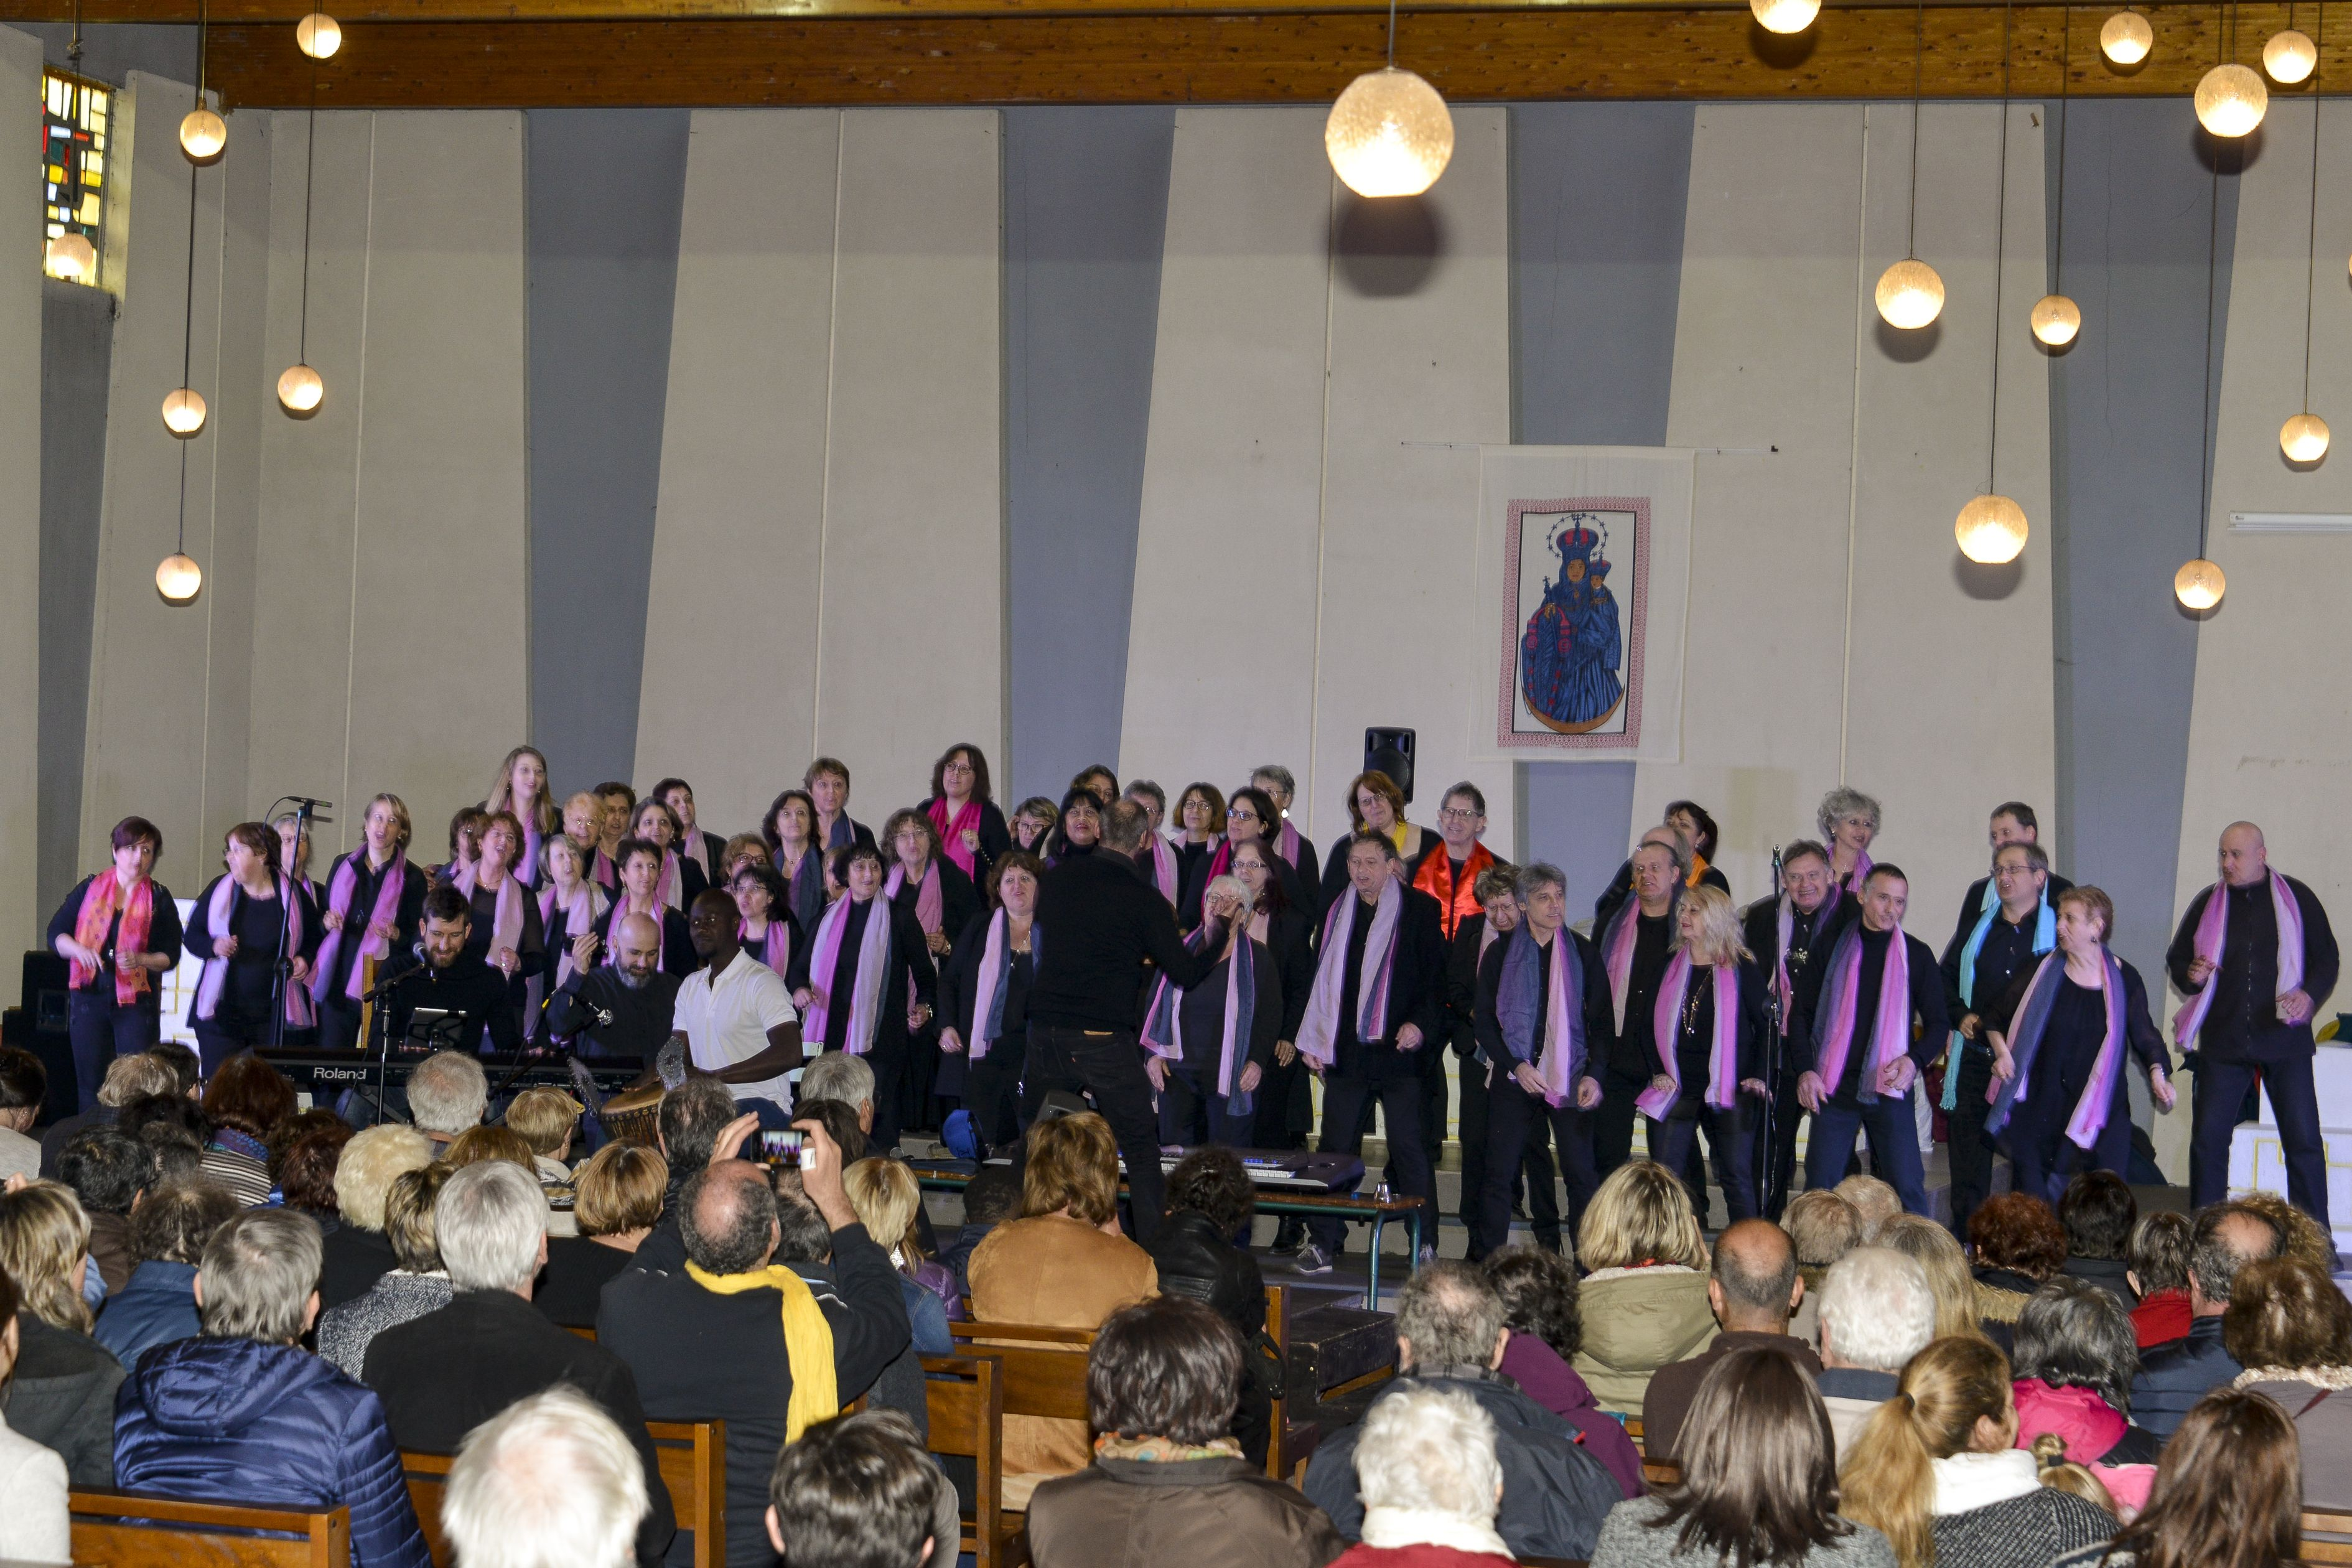 chorale Atout Chœur , 11-03-2018, Choisy le Roi